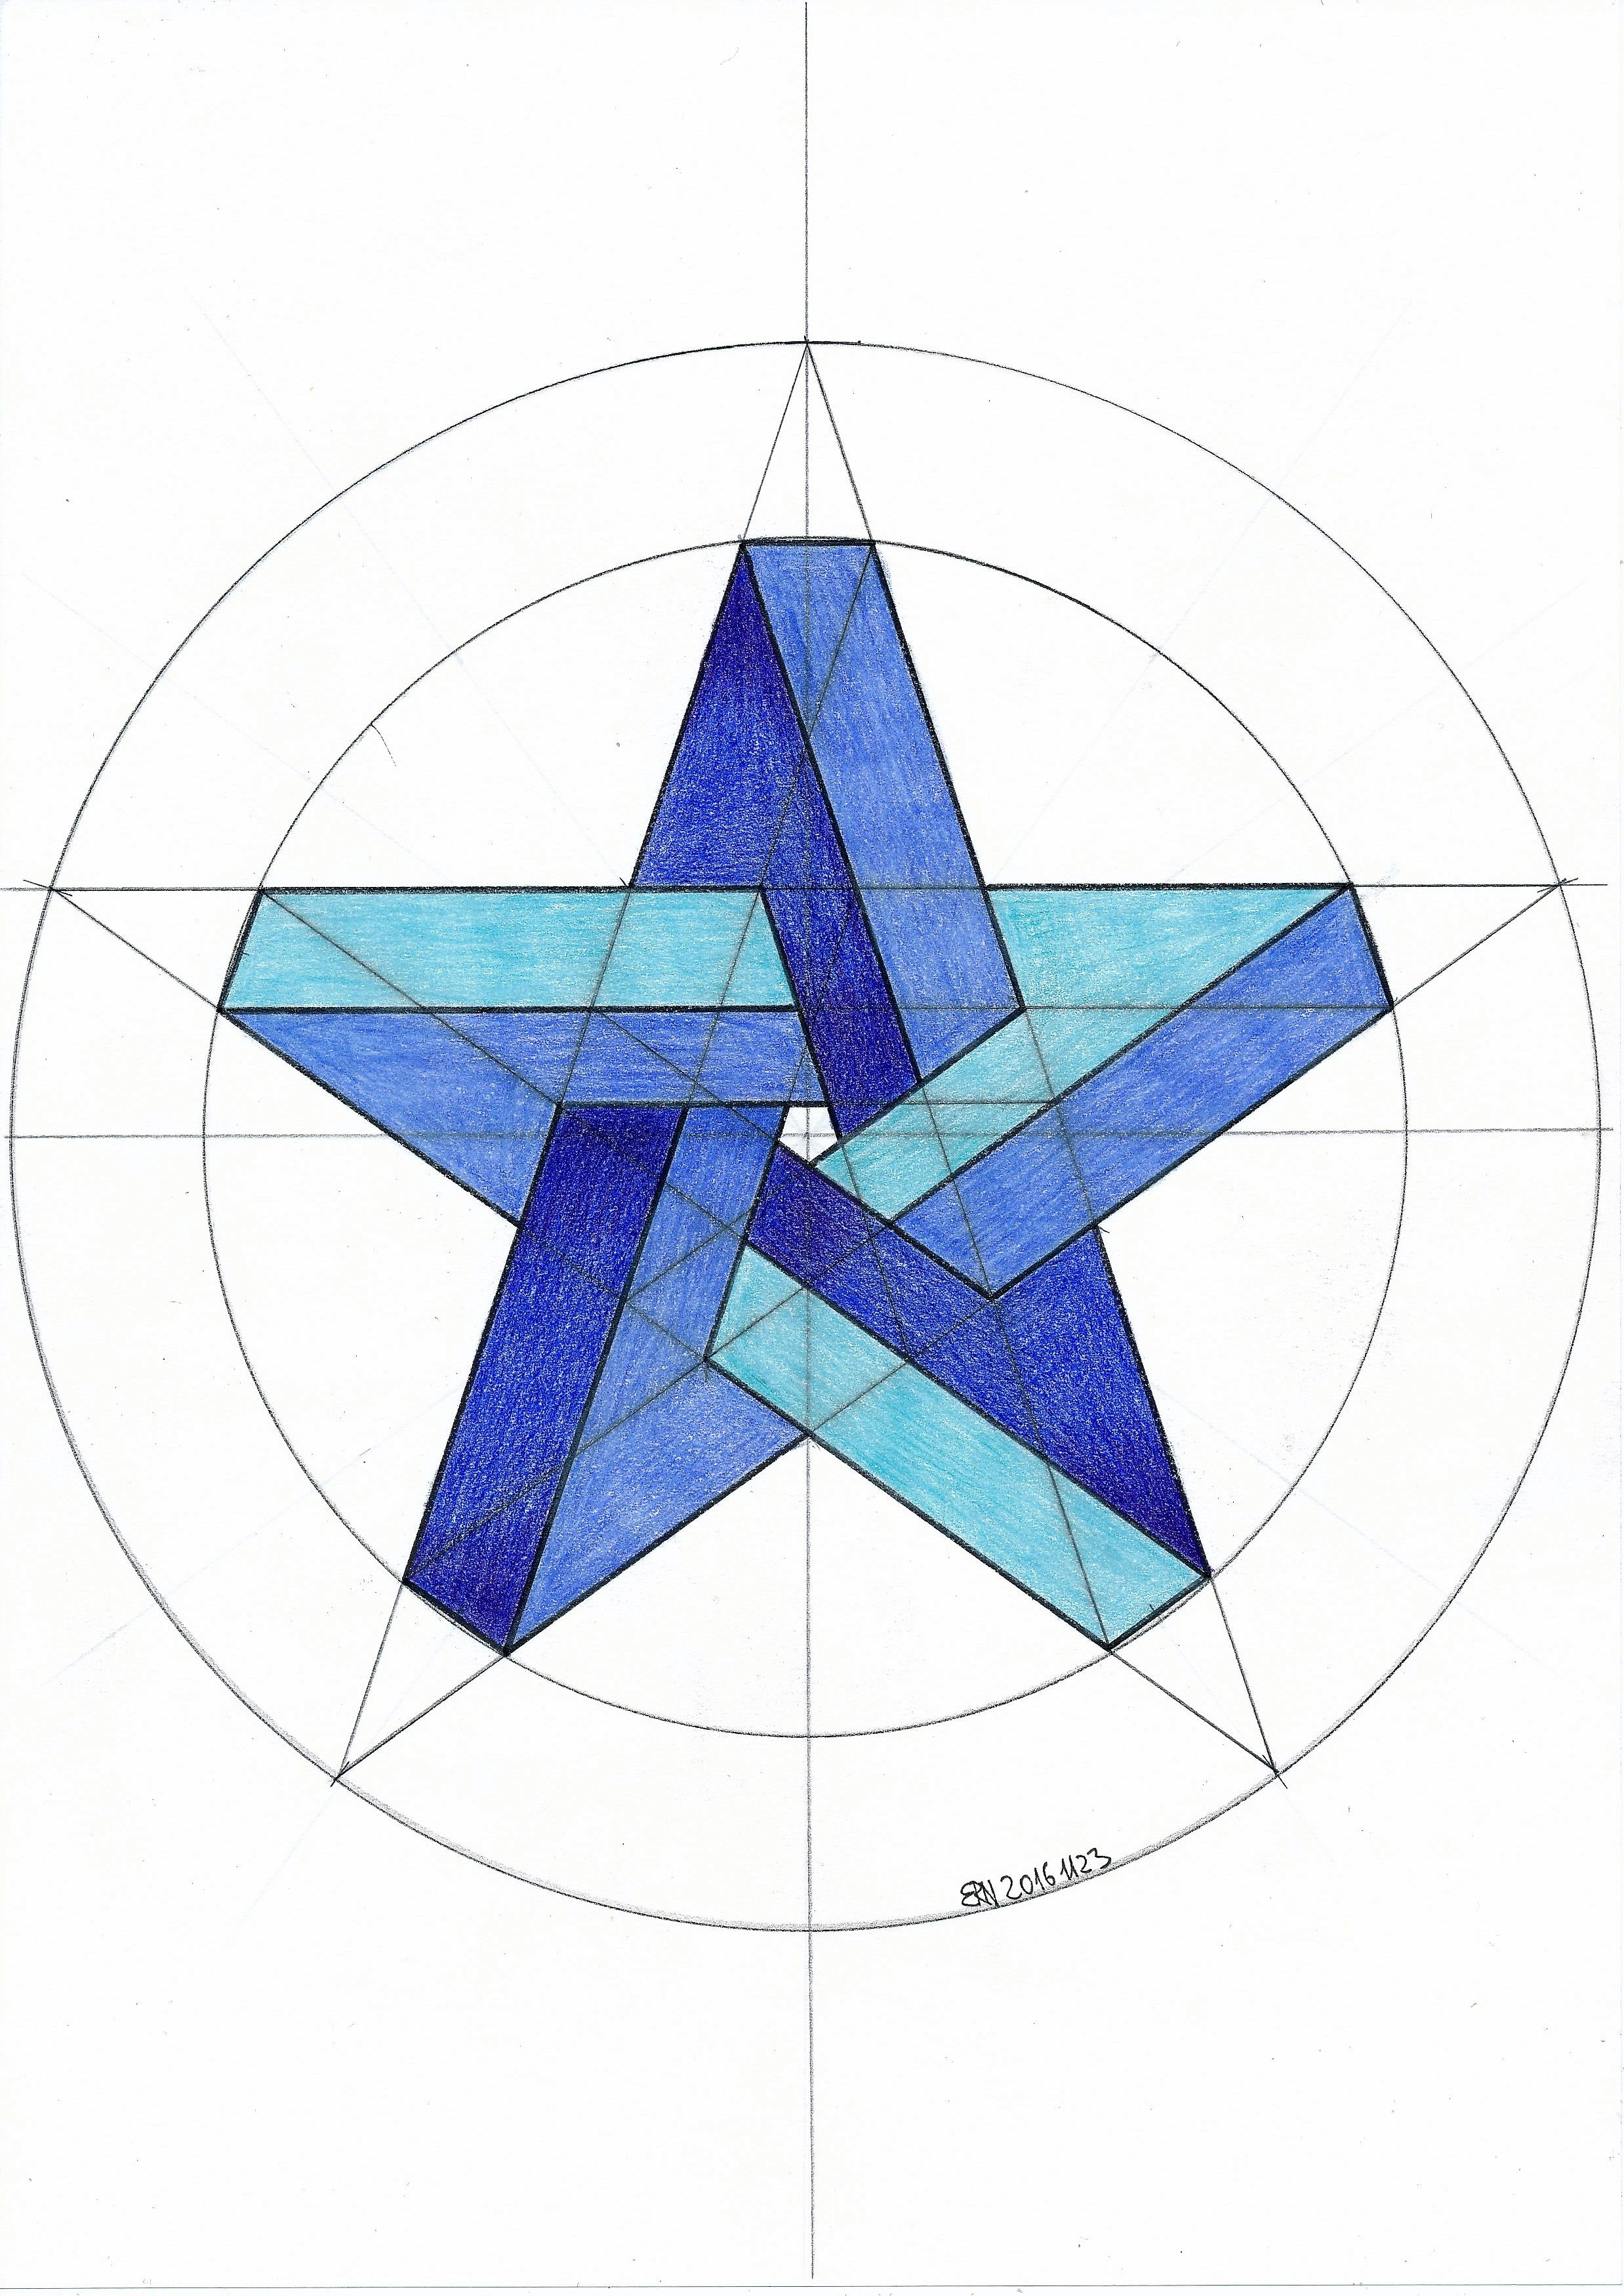 Solid Polyhedra Geometry Symmetry Pattern Hsndmade Regolo54 Mathart Escher Pentagon Circle Pen Arte De Geometria Periodo Geometrico Arte Geometrico